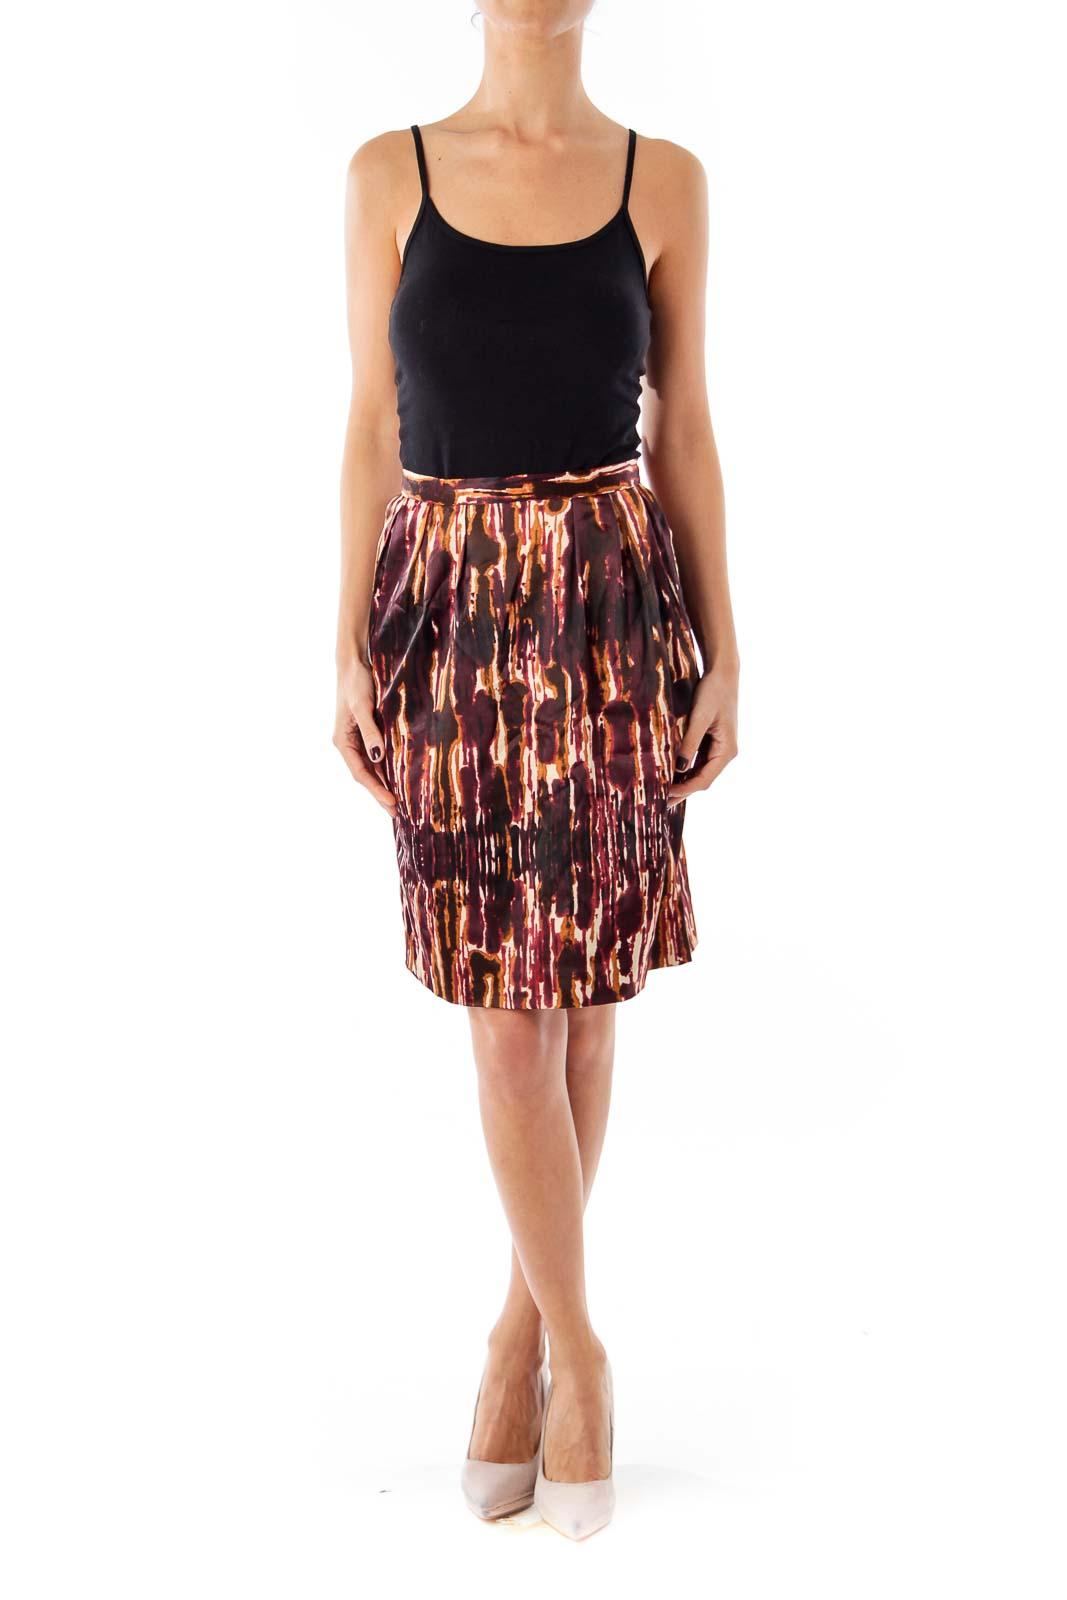 Brown & Red Dye Print Skirt